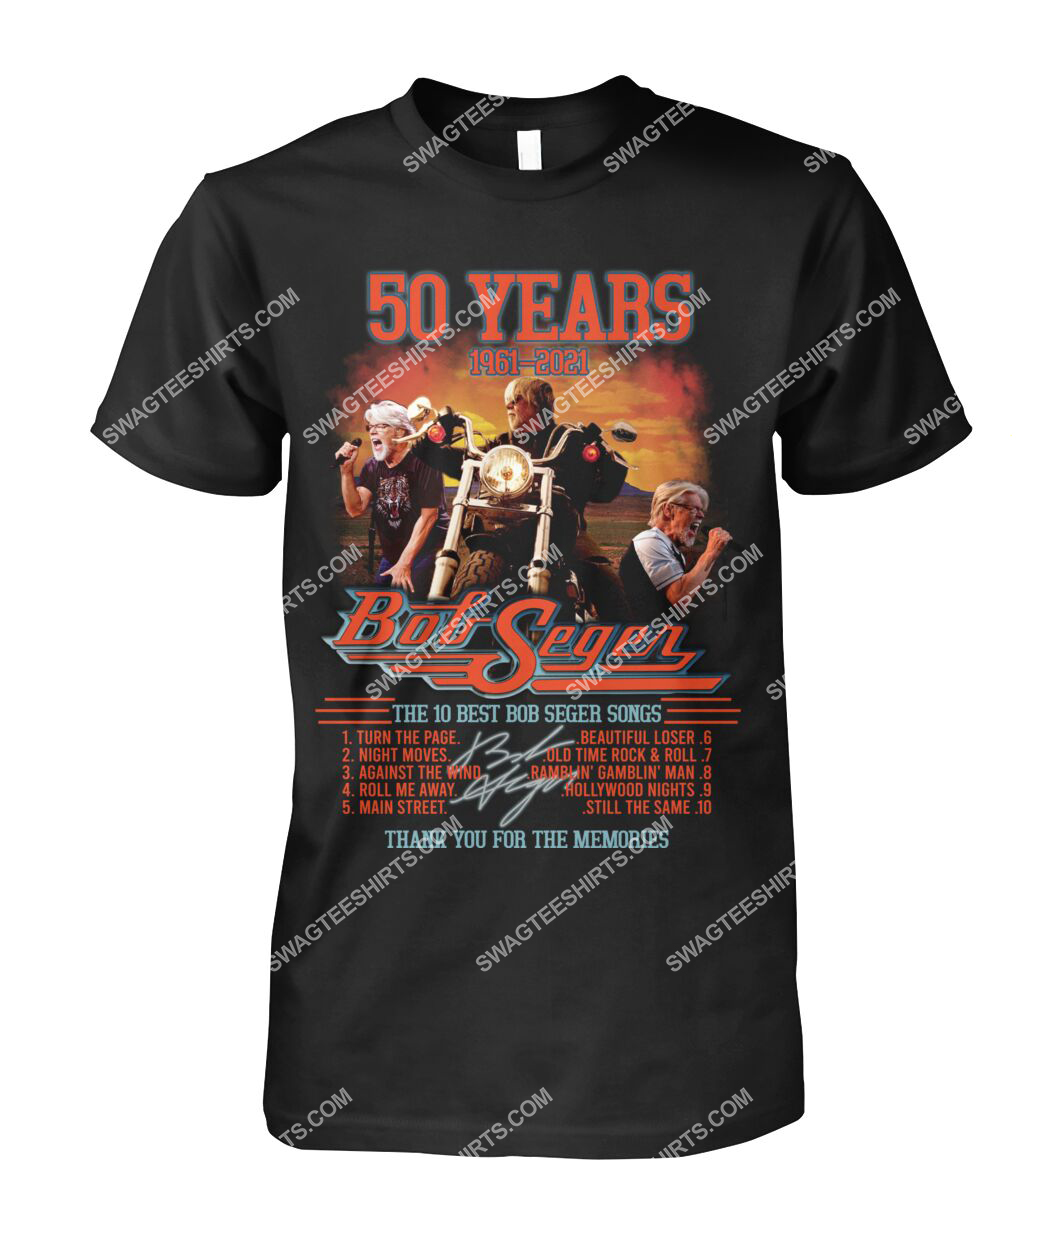 bob saget 50 years thank you for memories signature tshirt 1